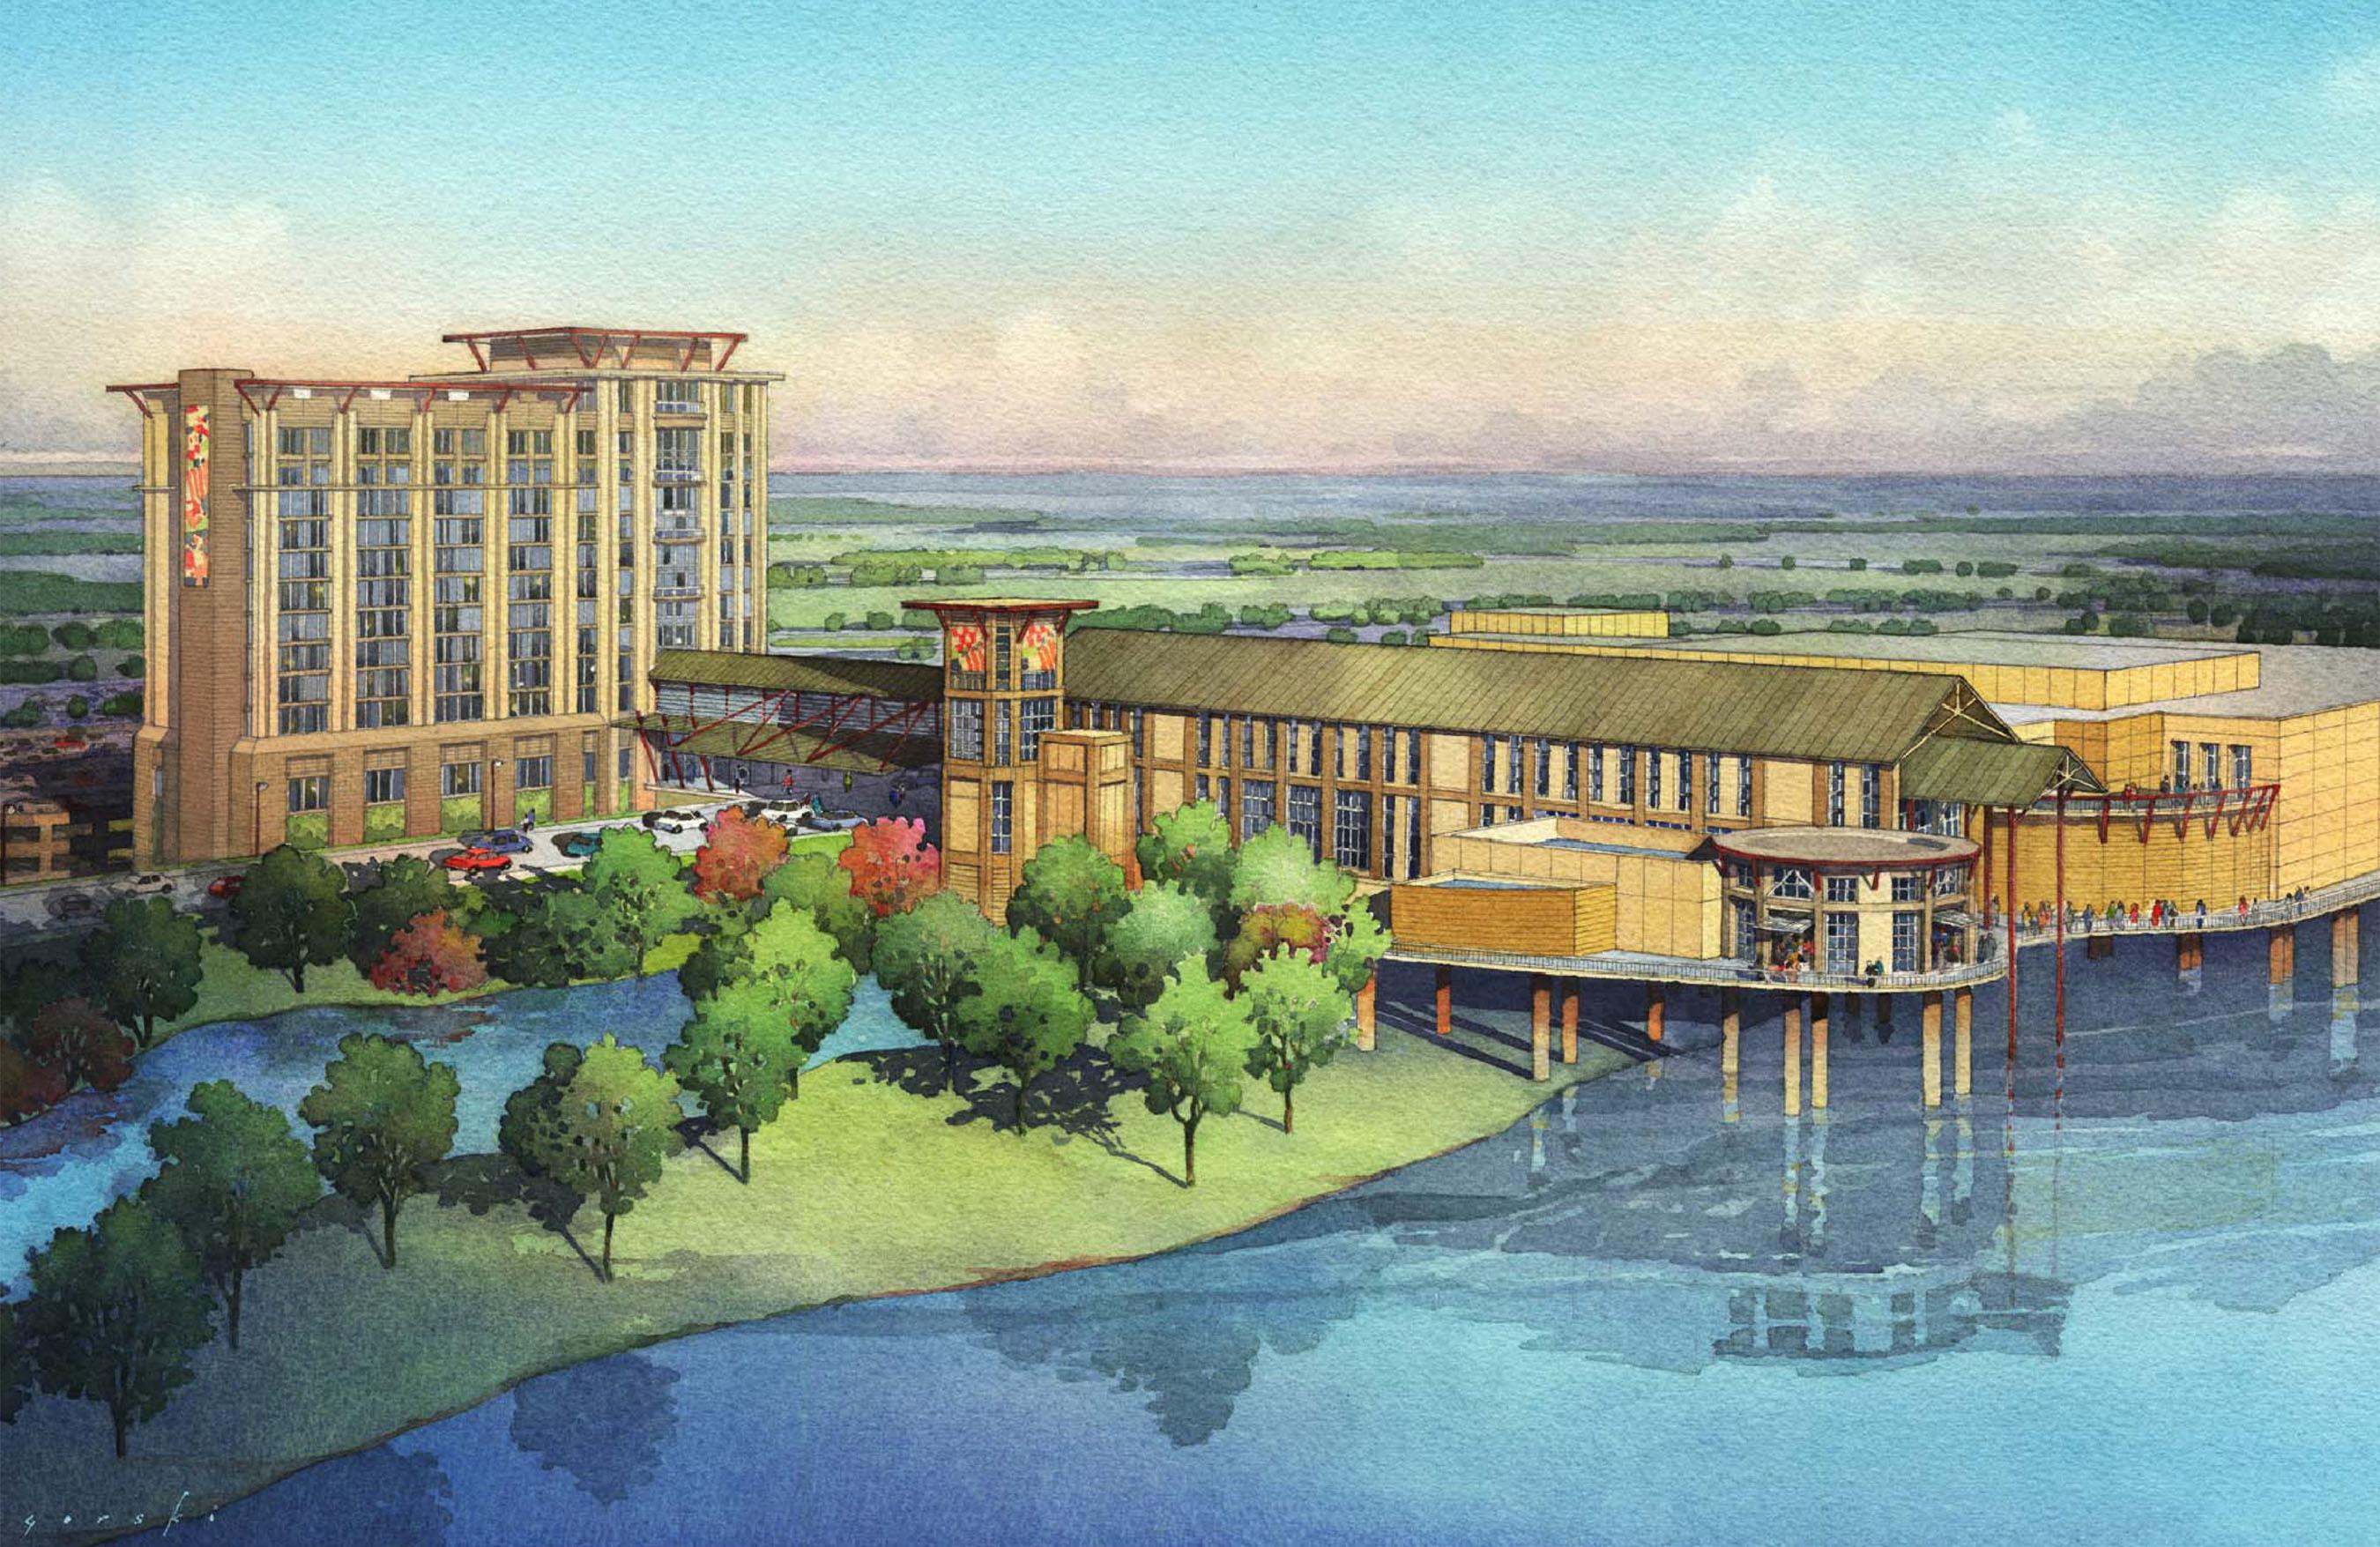 Casino louisiana open pinnacle casino in oklahoma city ok